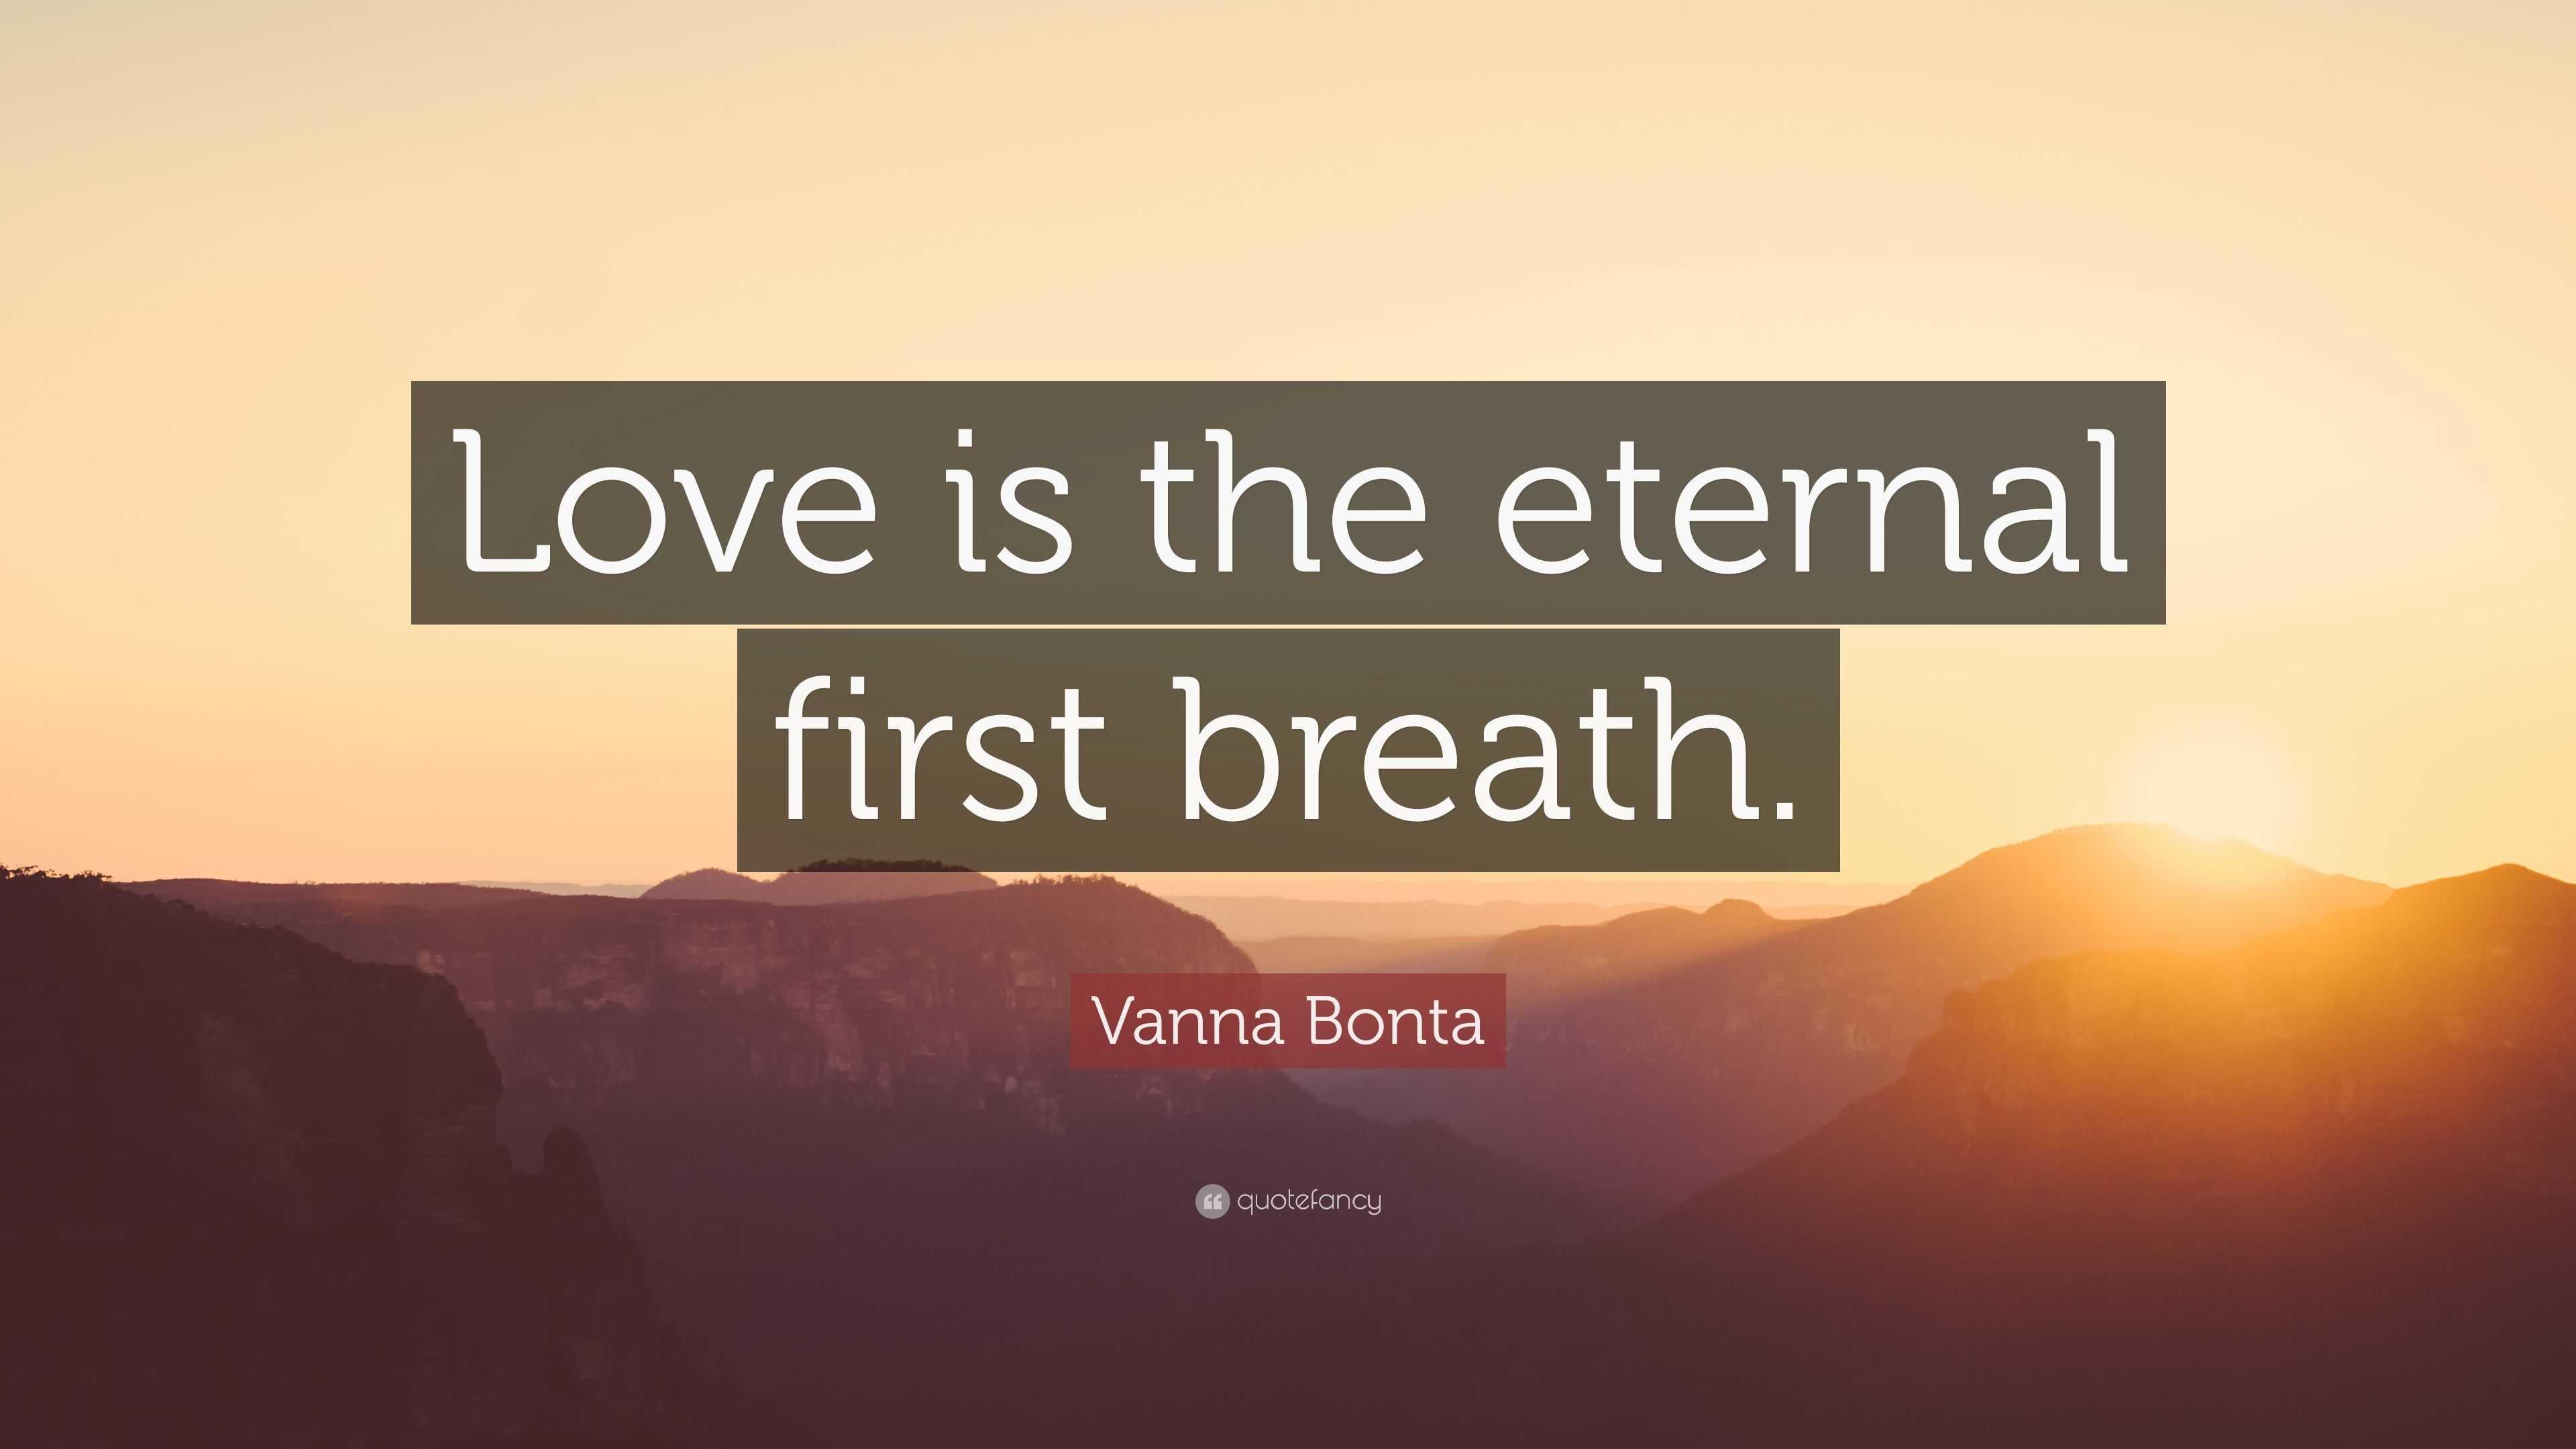 Vanna Bonta Quote: U201cLove Is The Eternal First Breath.u201d